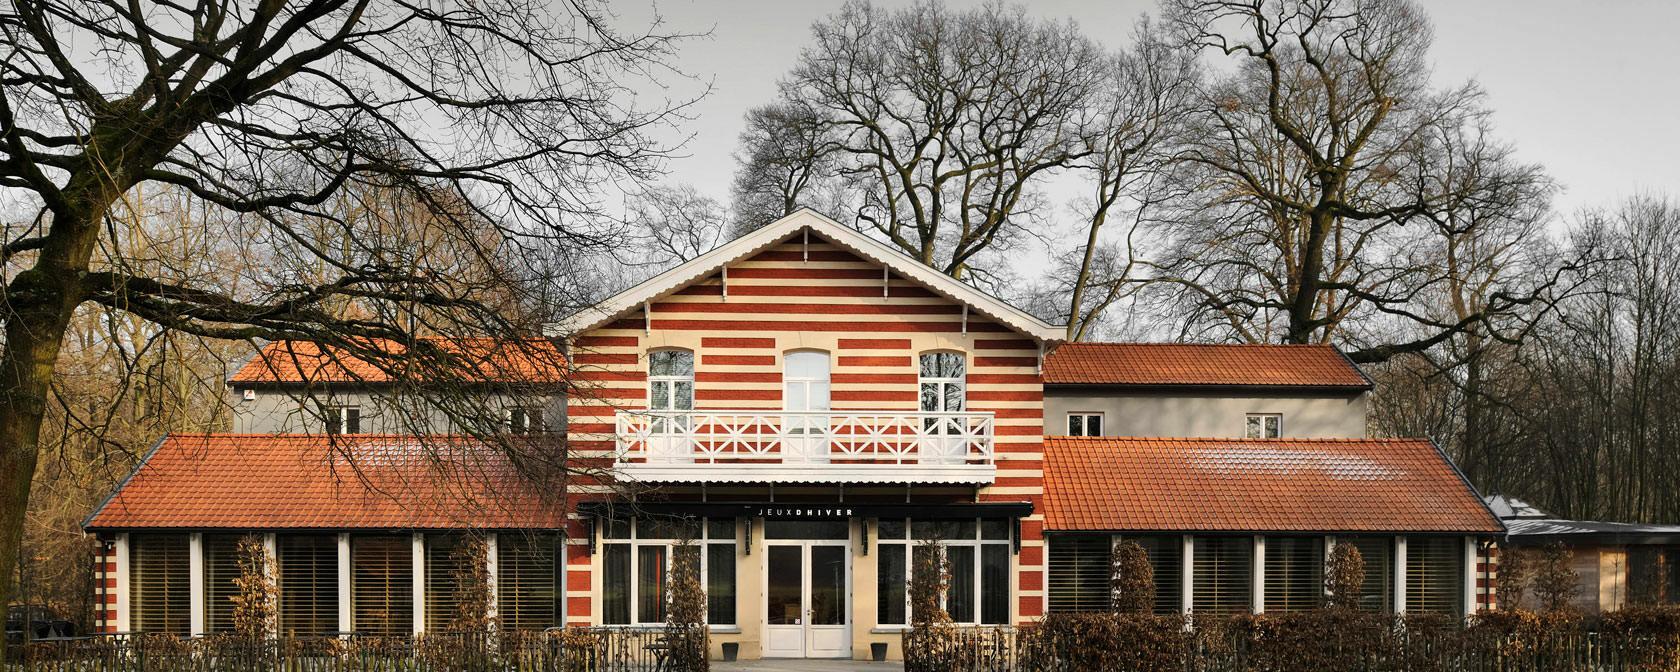 BMMA Magazine – Debriefing with Valérie Vangeel, Nestlé Benelux